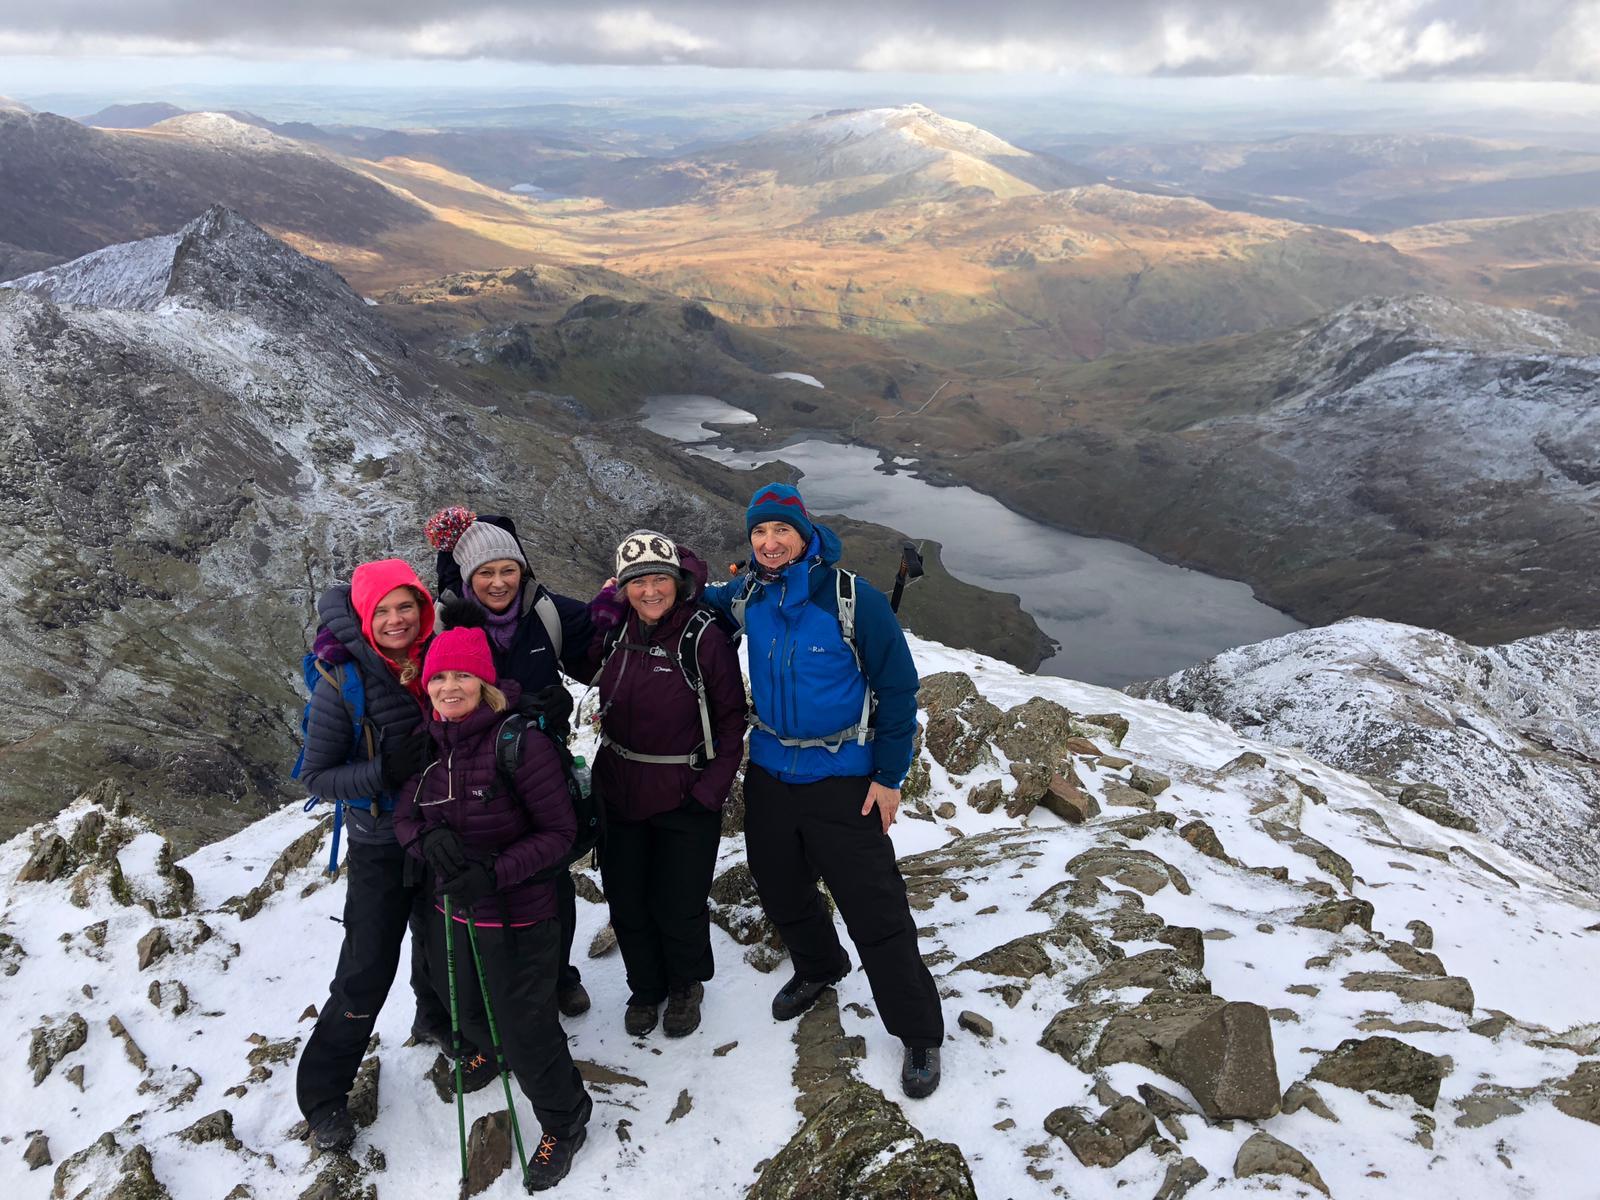 At the top of Snowdon.